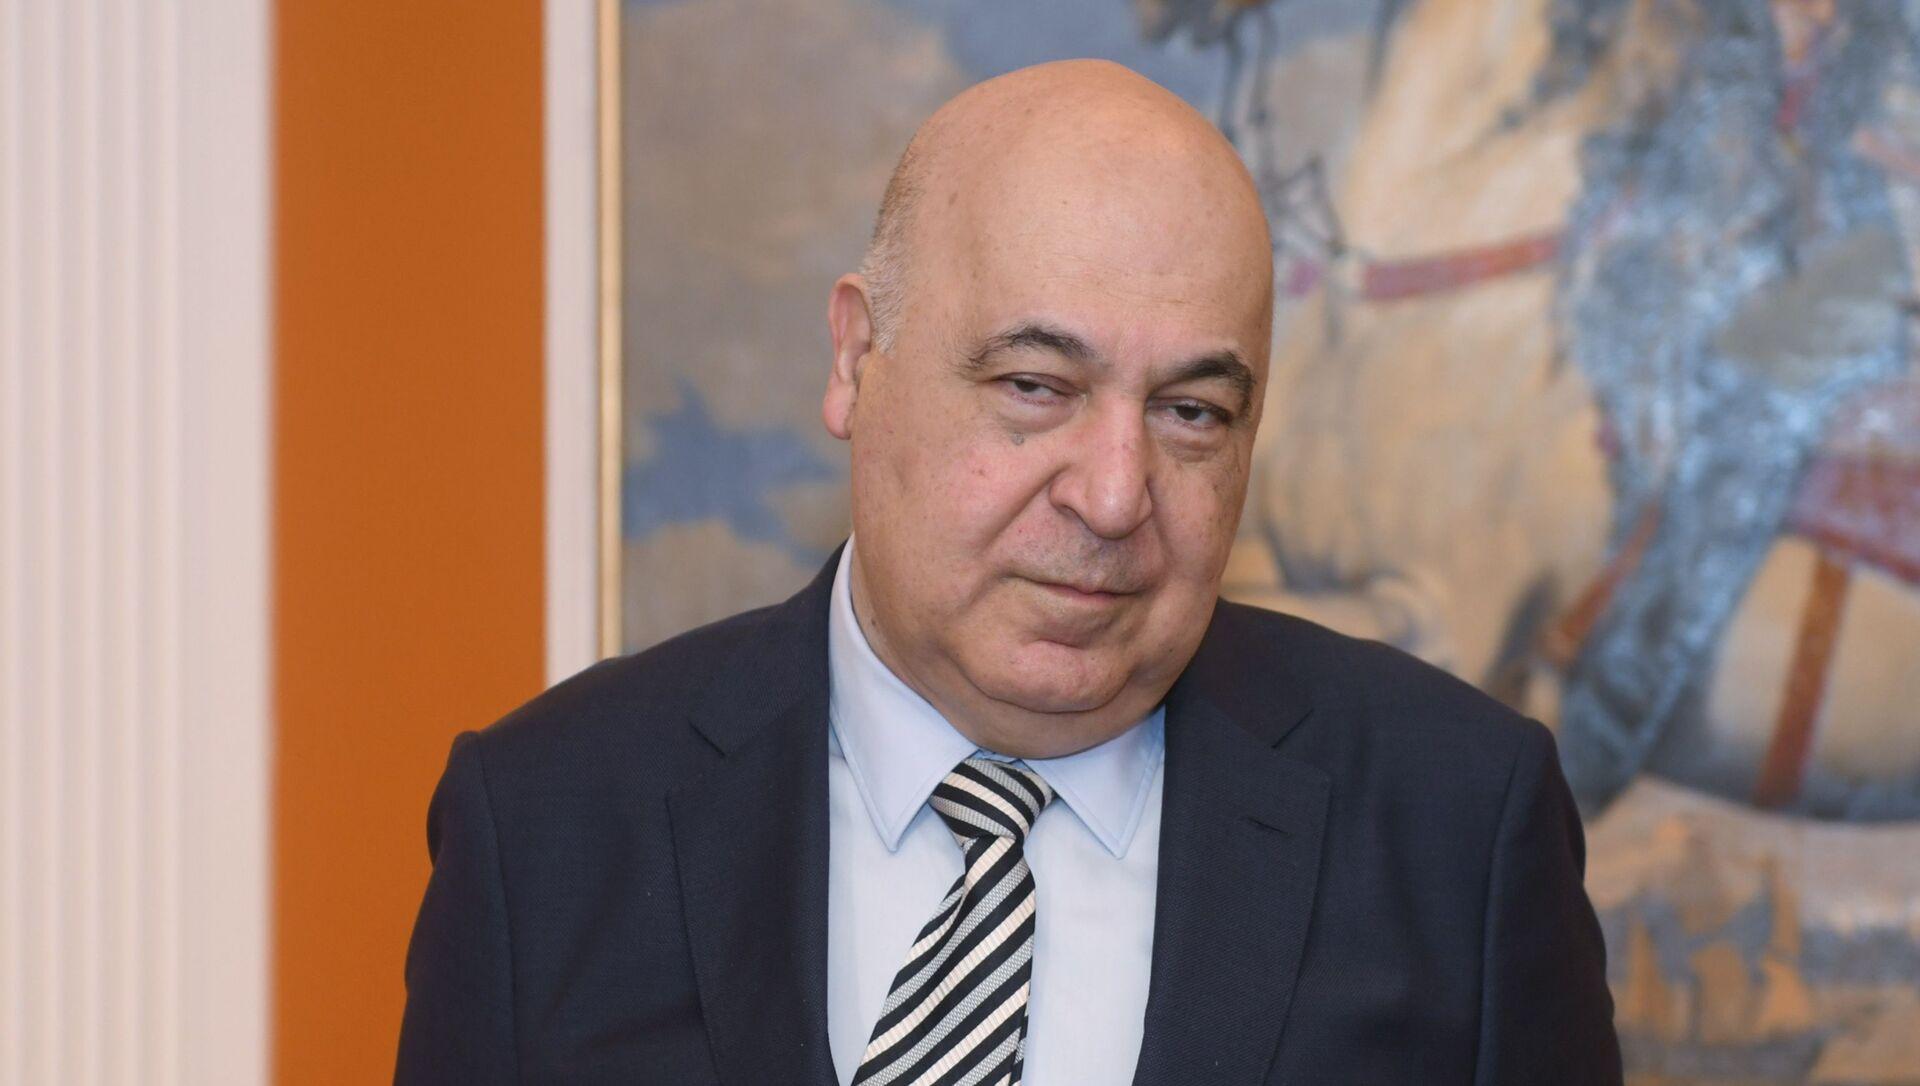 Азербайджанский писатель Чингиз Абдуллаев - Sputnik Азербайджан, 1920, 31.08.2021